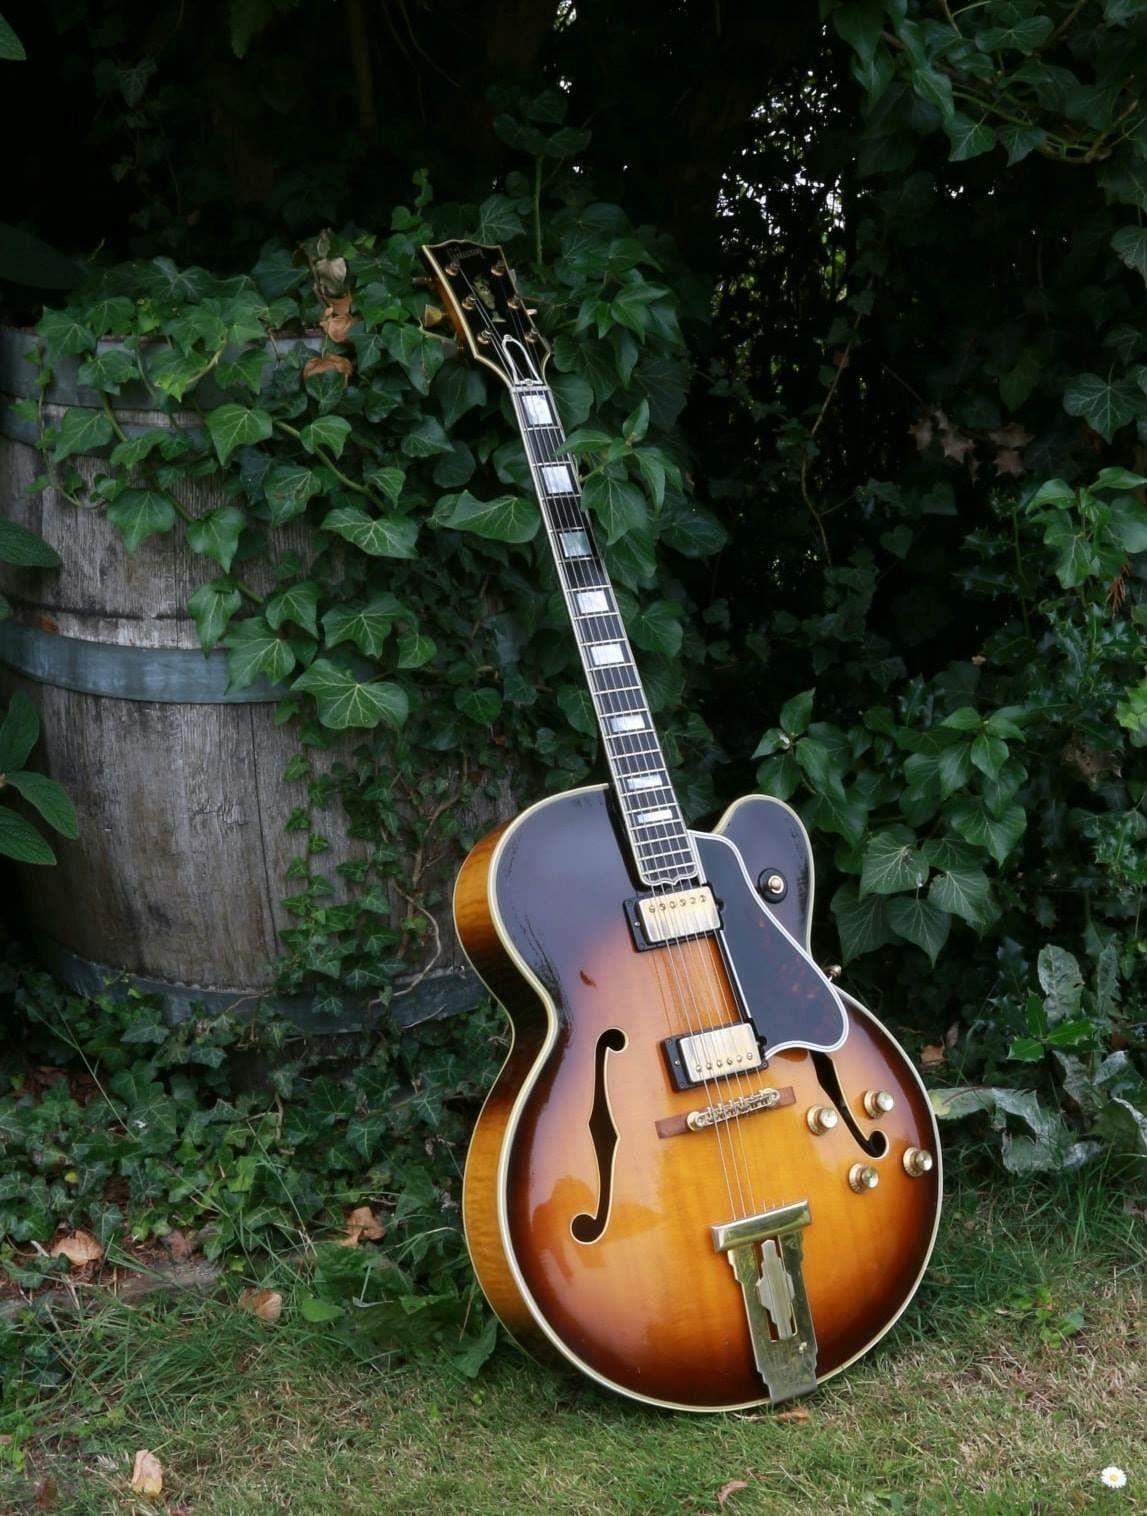 1961 Gibson L 5 Ces Con Imagenes Guitarras